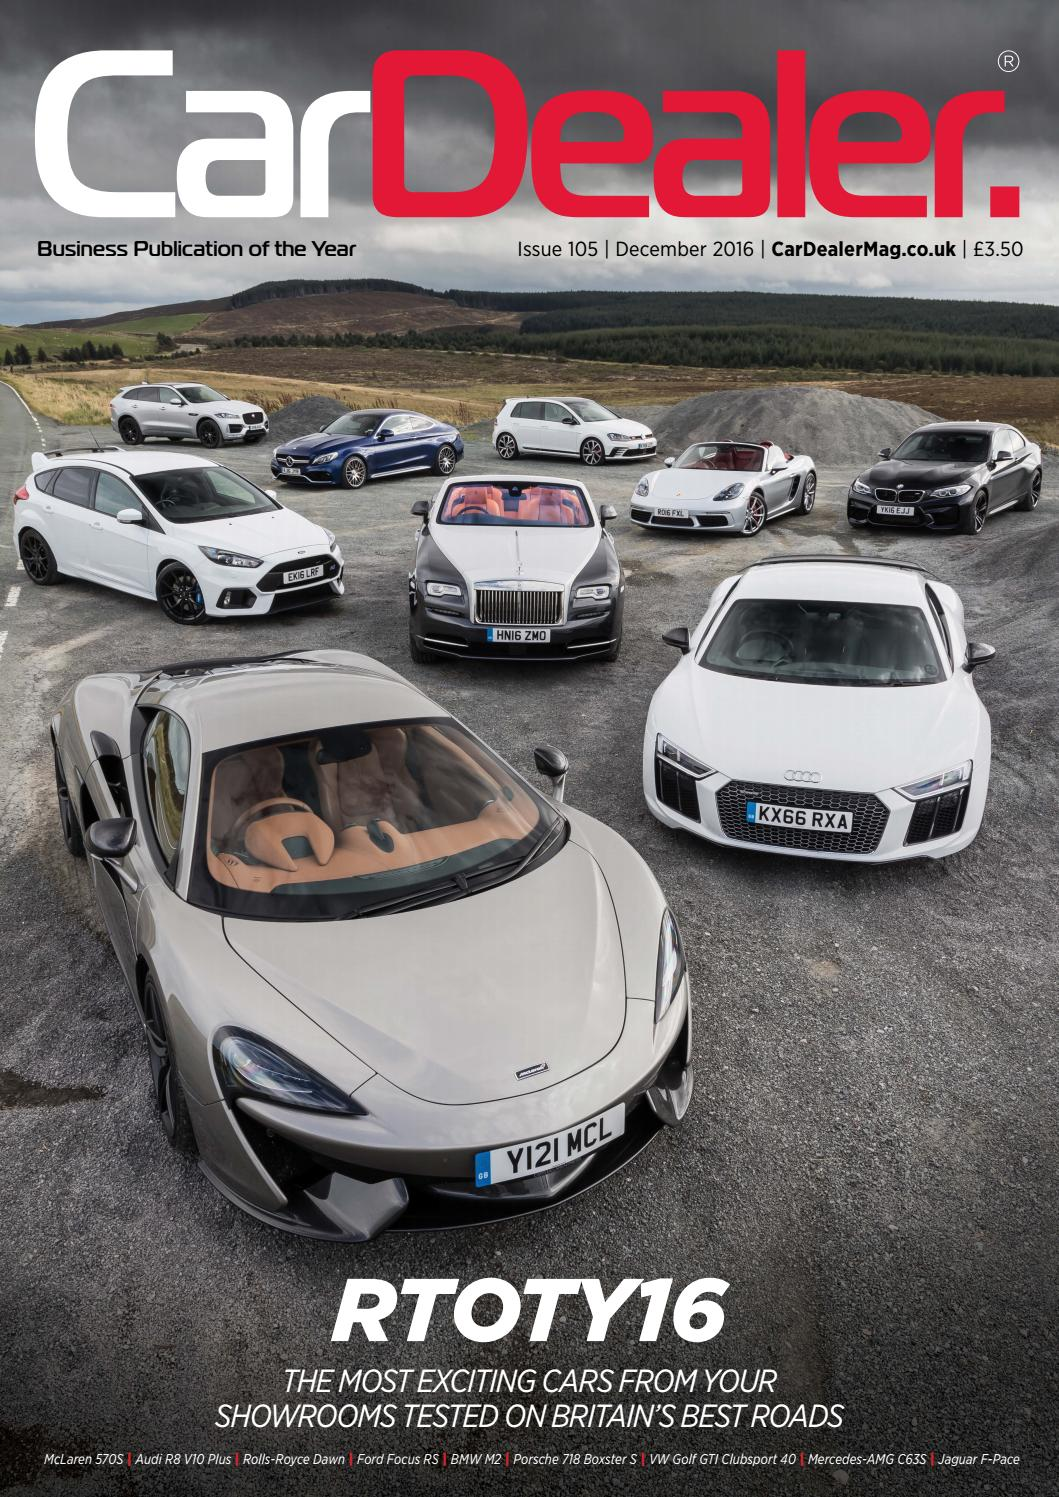 hight resolution of car dealer magazine issue 105 by blackballmedia issuu bmw m20 besides 2017 kia rio interior on ignition coil wiring harness